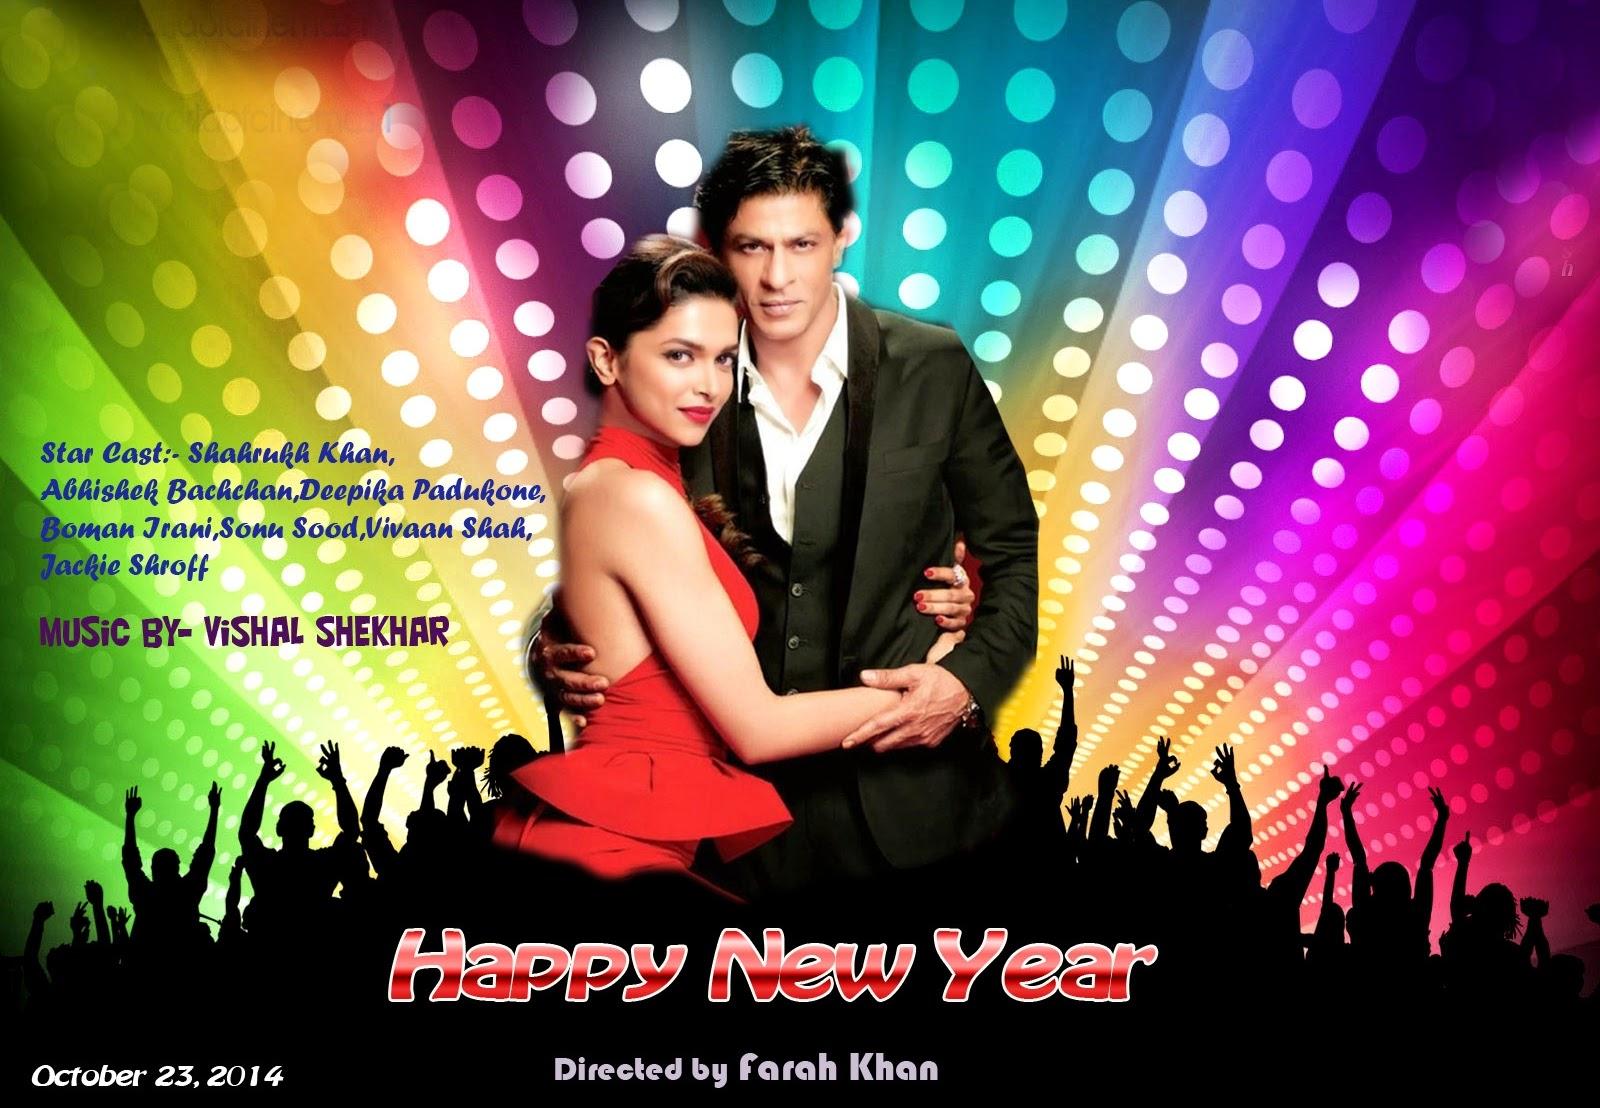 Movie happy new year dipika padu with sharukh khan 2014 (Actor and Actress Hd Wallpaper)